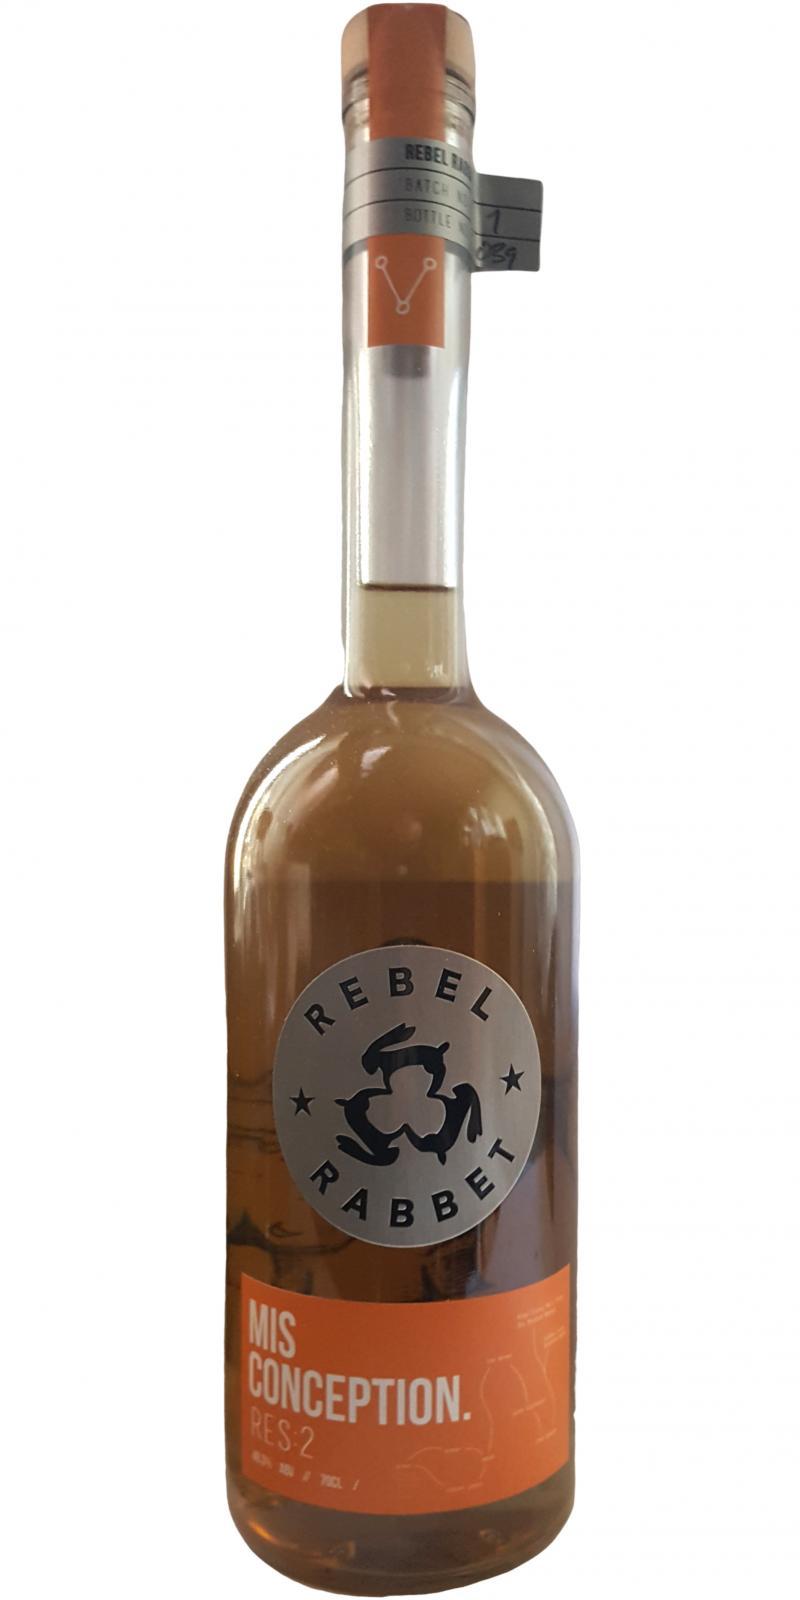 Rebel Rabbet RES2: Misconception